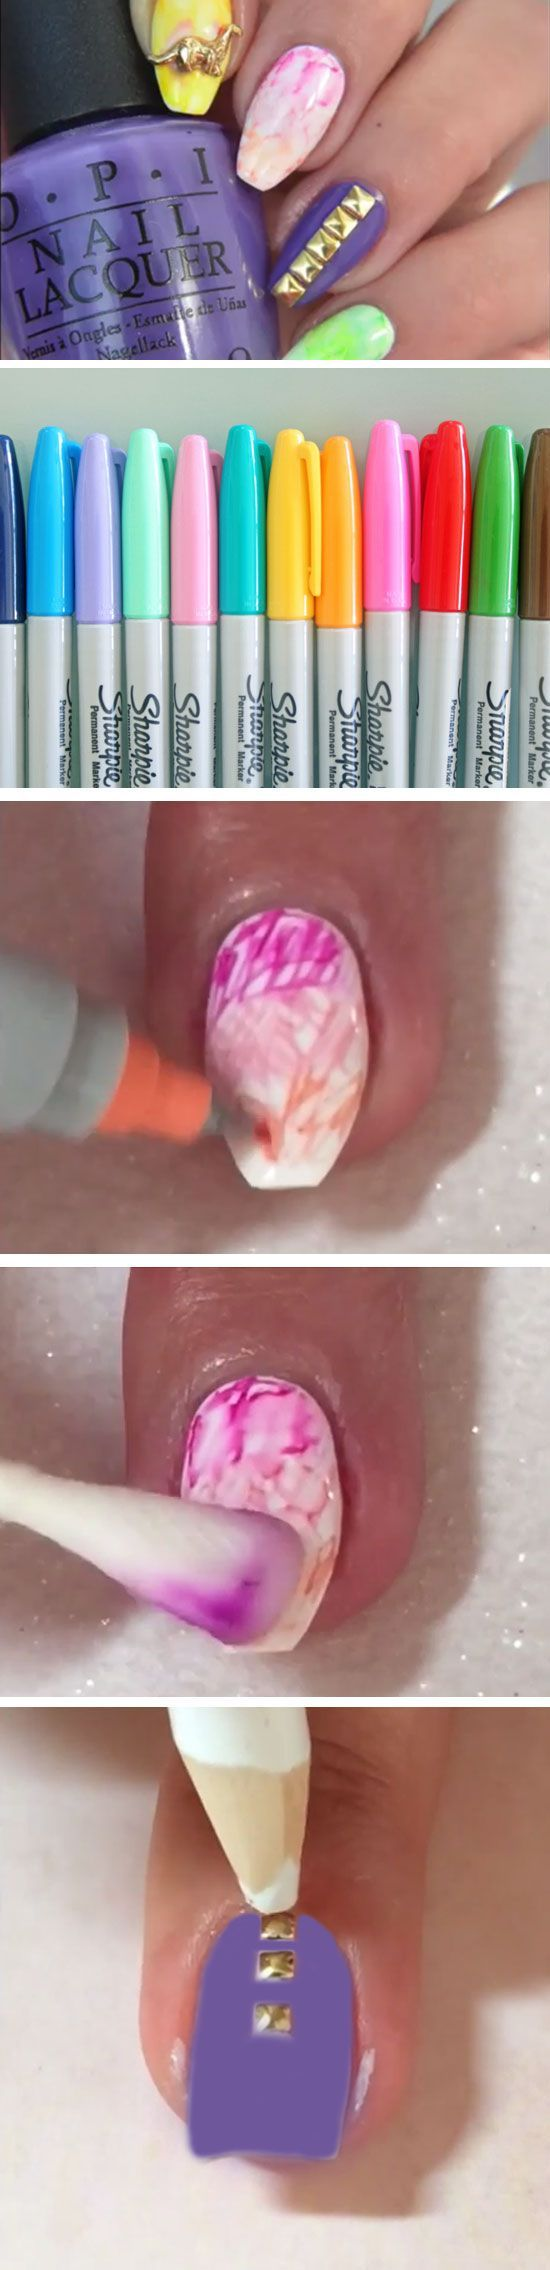 Sharpie Nails Tutorial